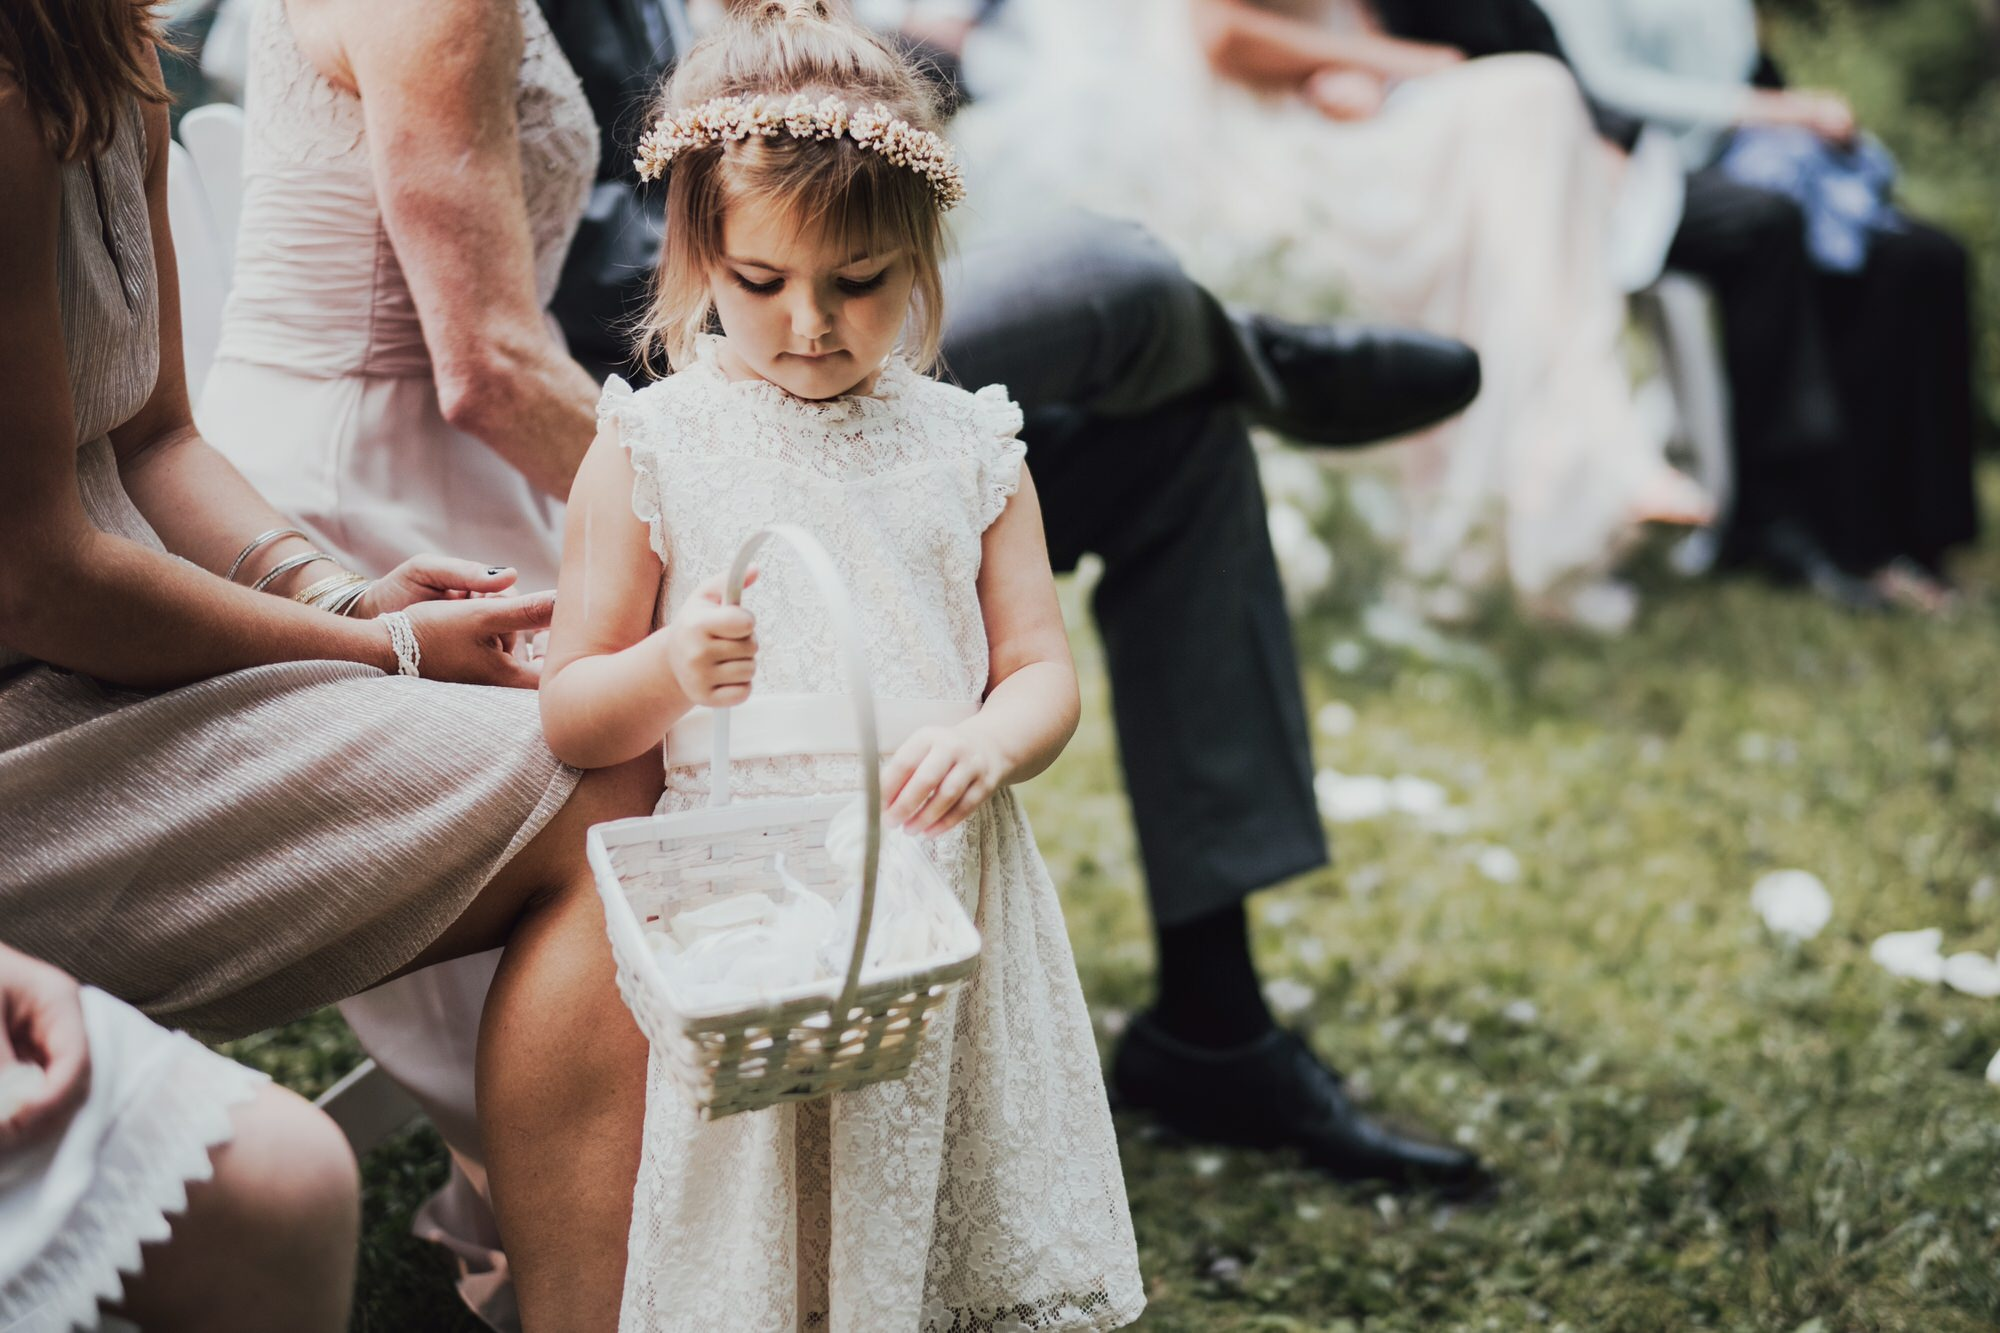 emily-aaron-rochester-new-york-wedding-photographer-154.JPG